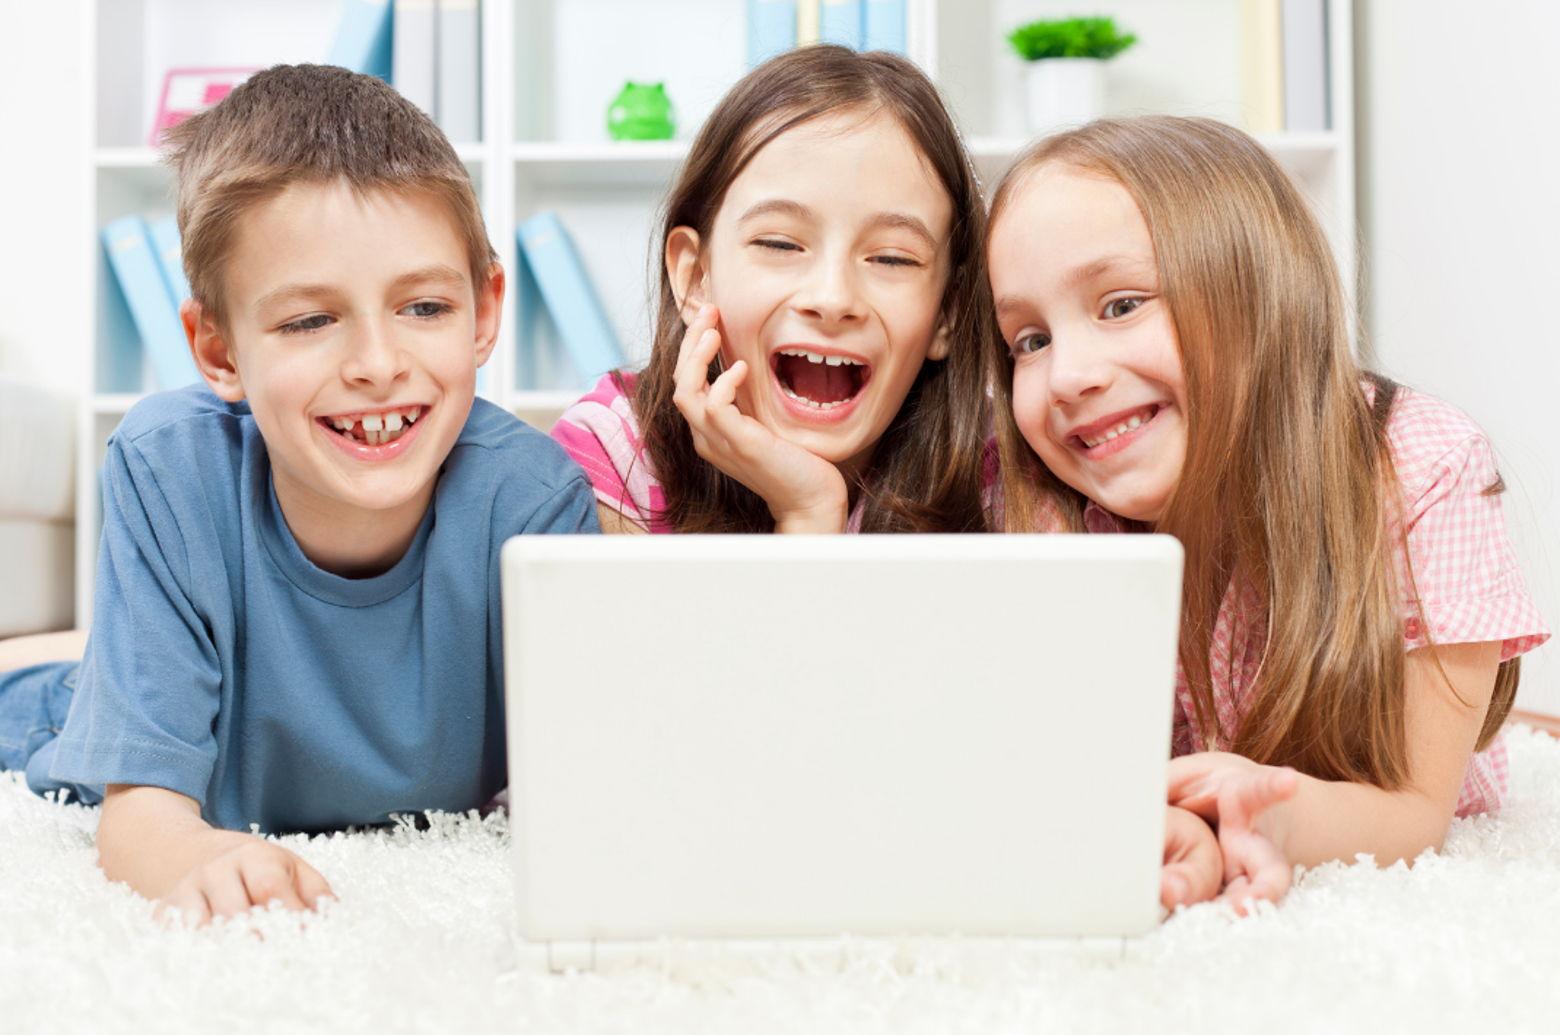 Kids watching shows